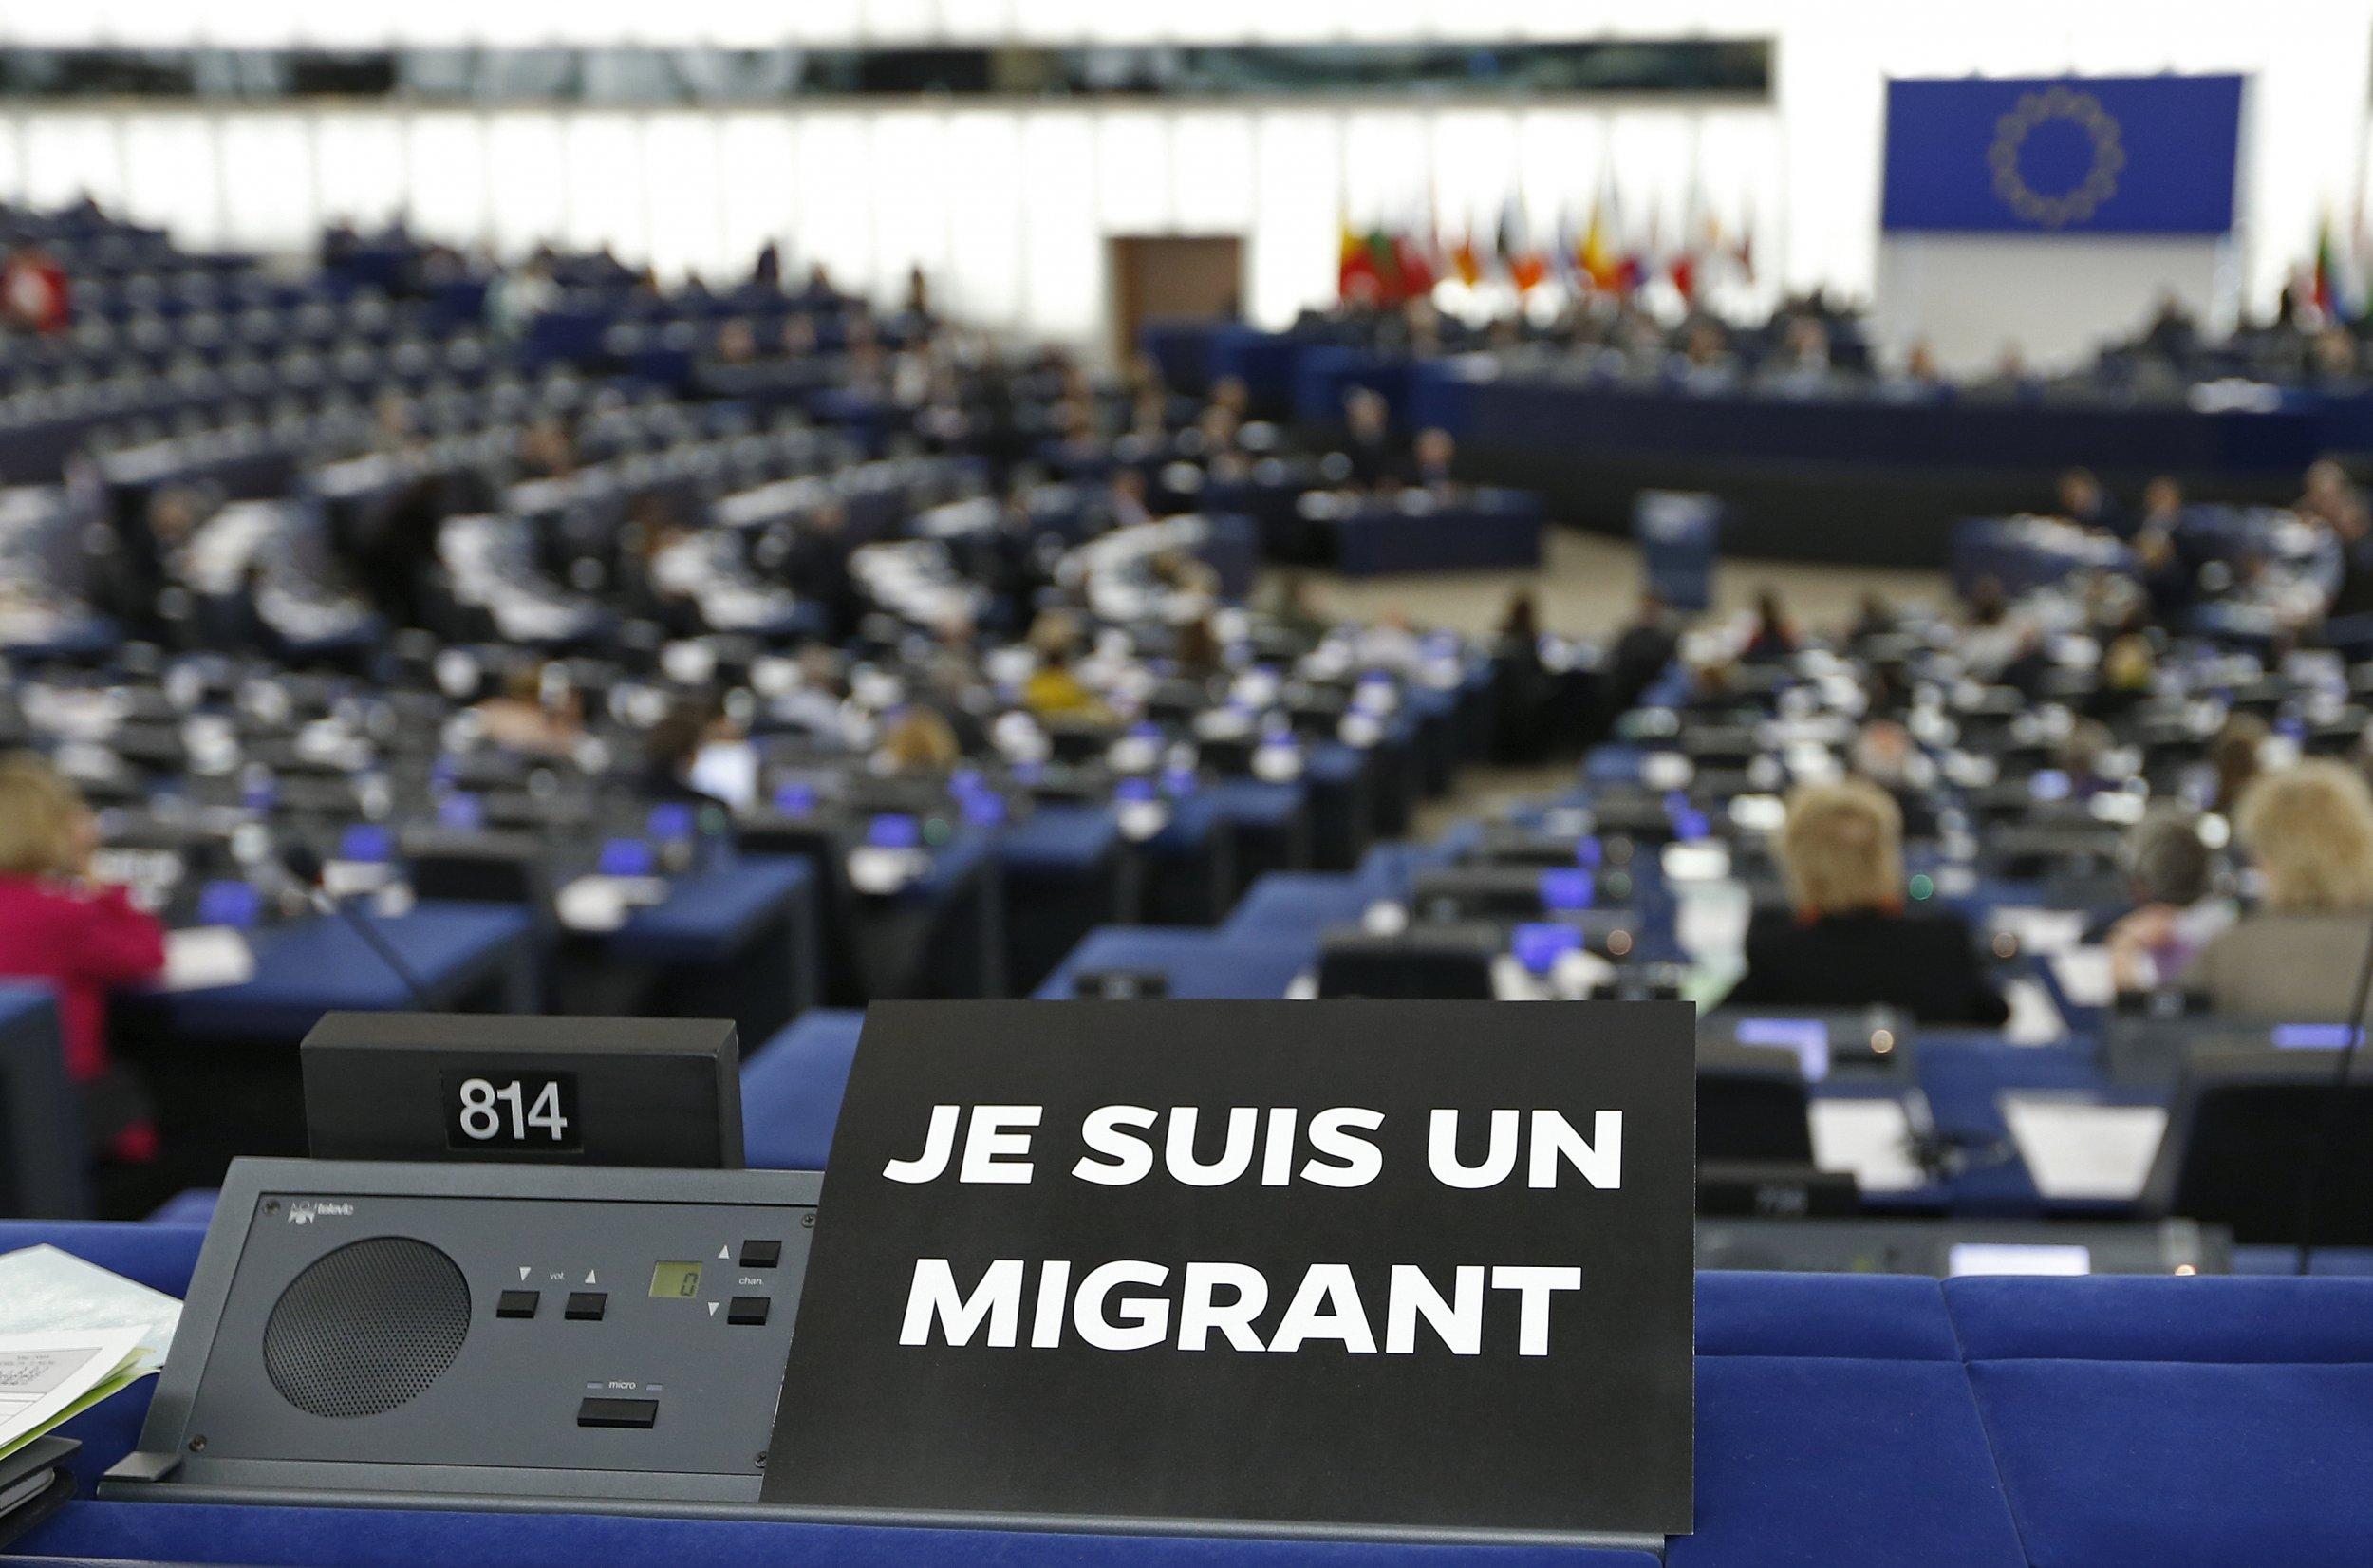 Je suis un migrant